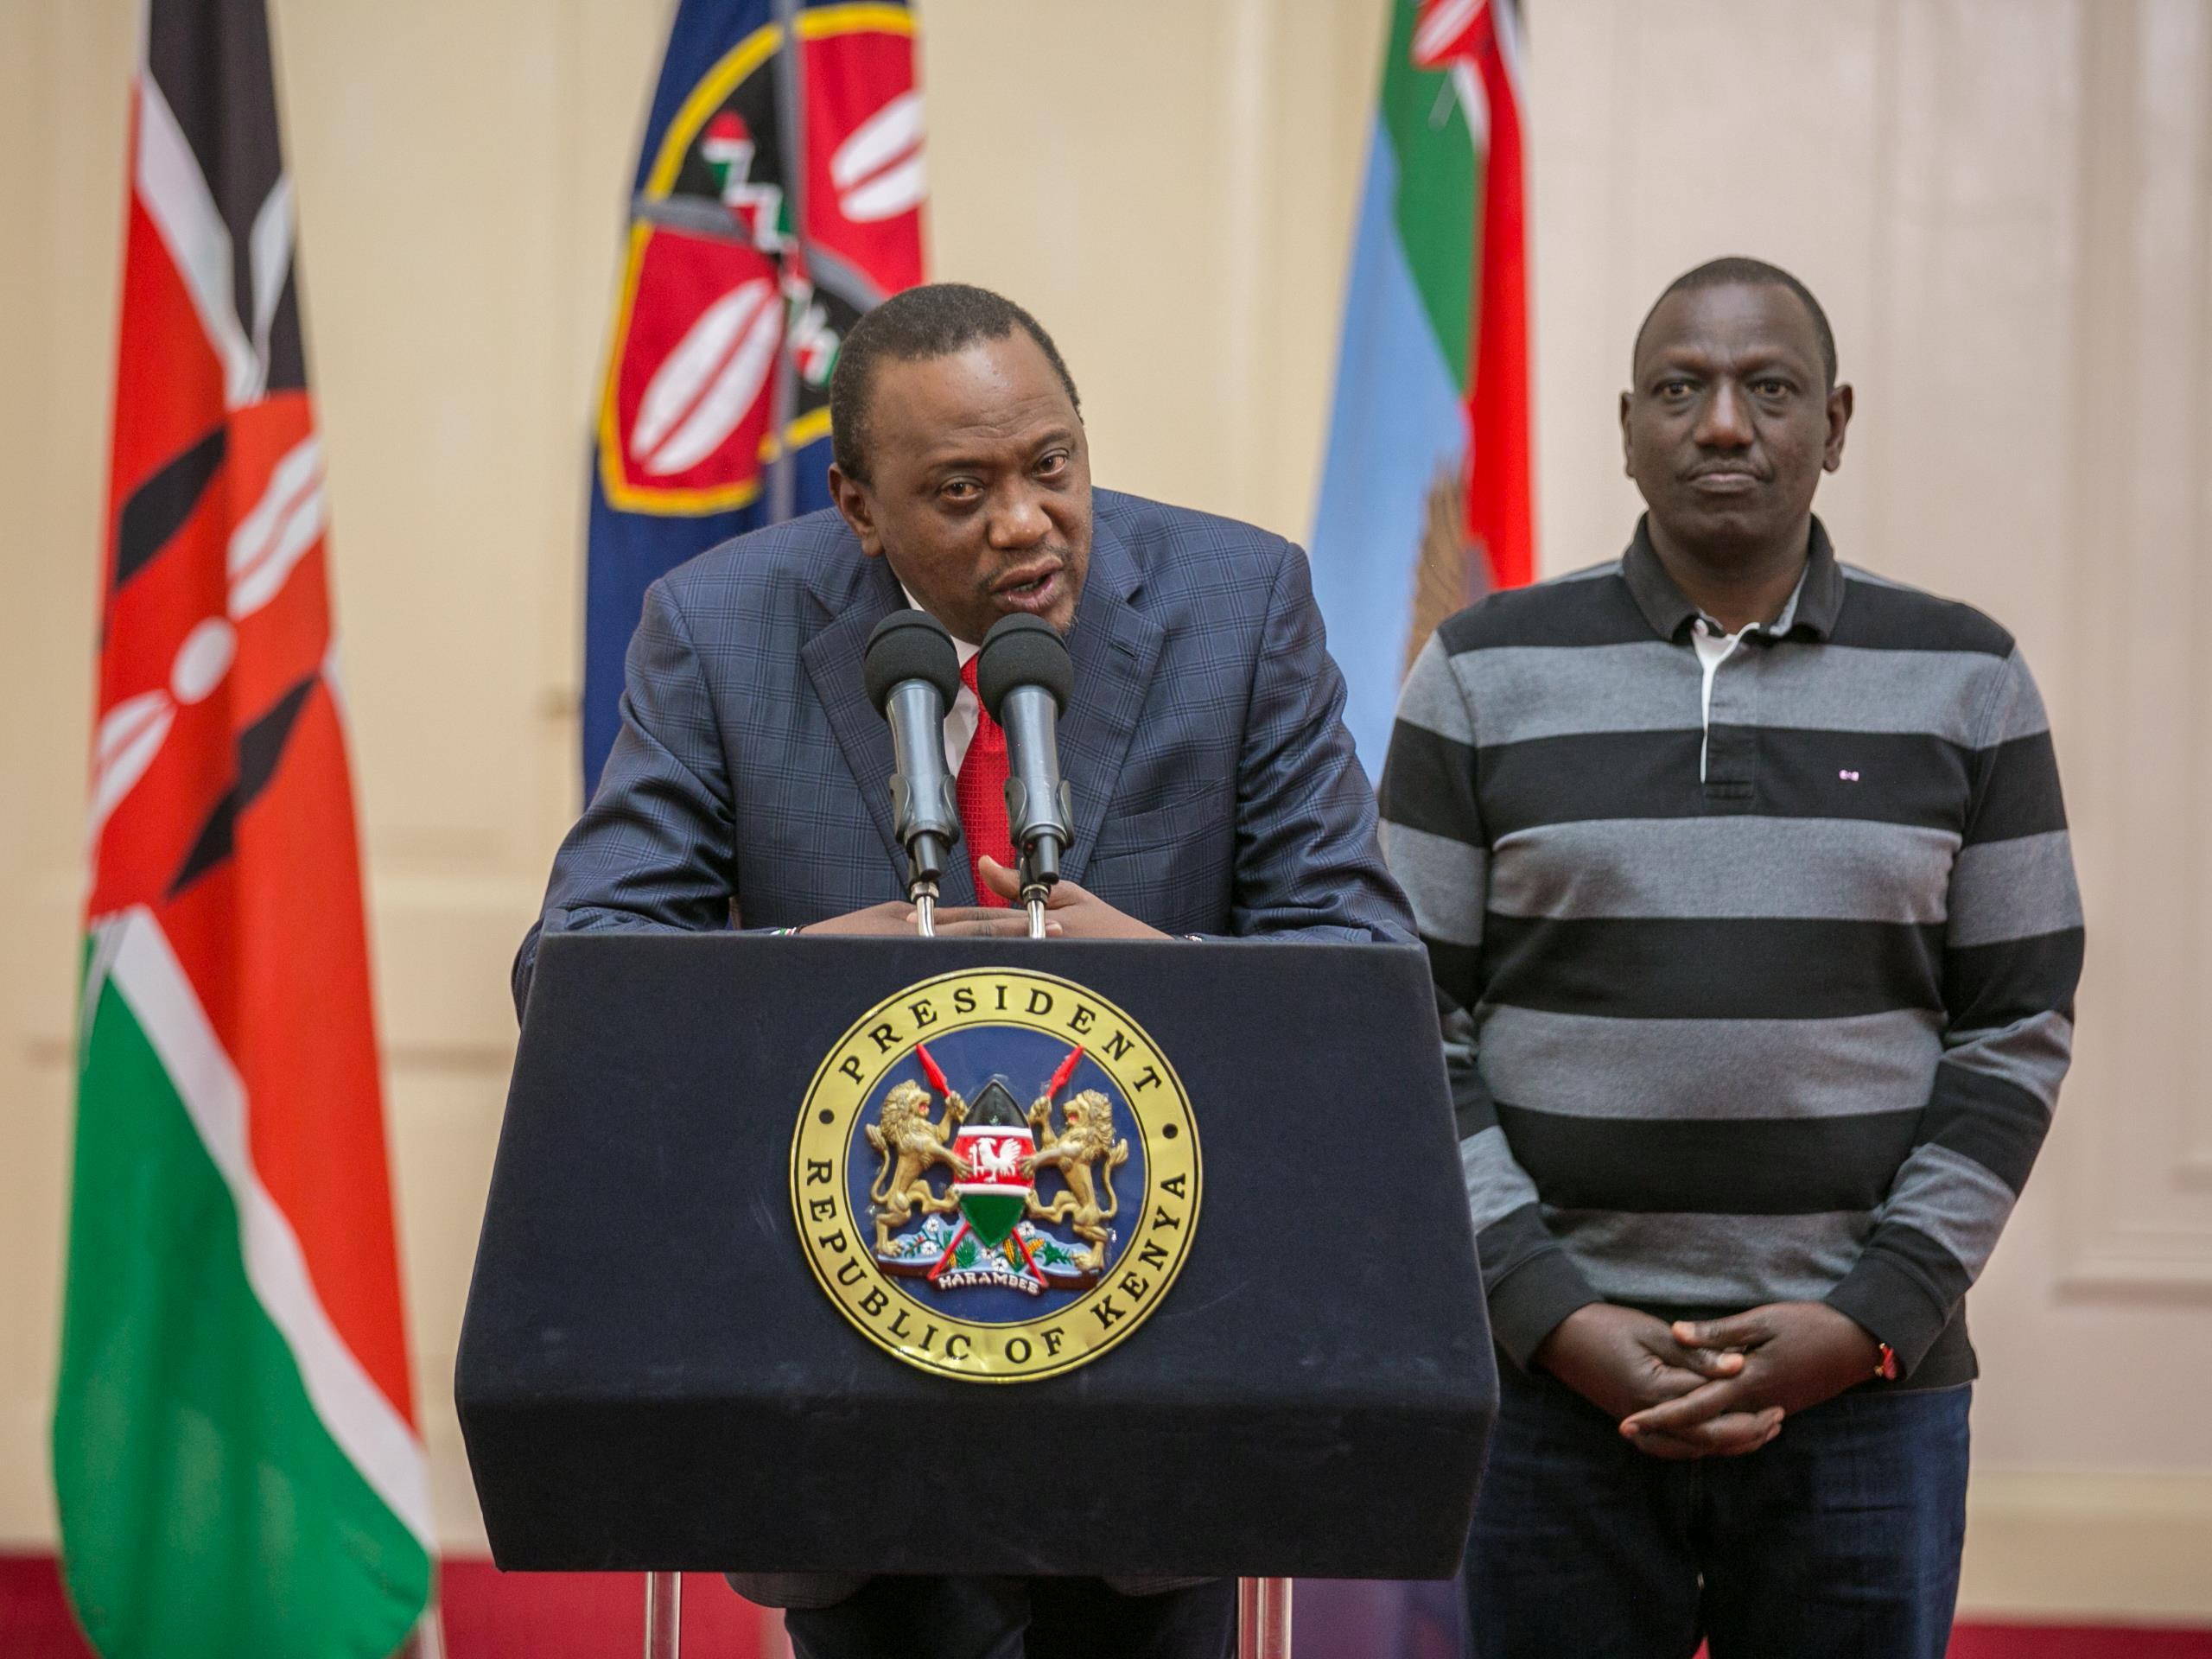 Kenya's President Uhuru Kenyatta flanked by his Deputy William Ruto addresses the nation at State House in Nairobi, Kenya September 1, 2017. Presidential Press Service/Handout via REUTERS